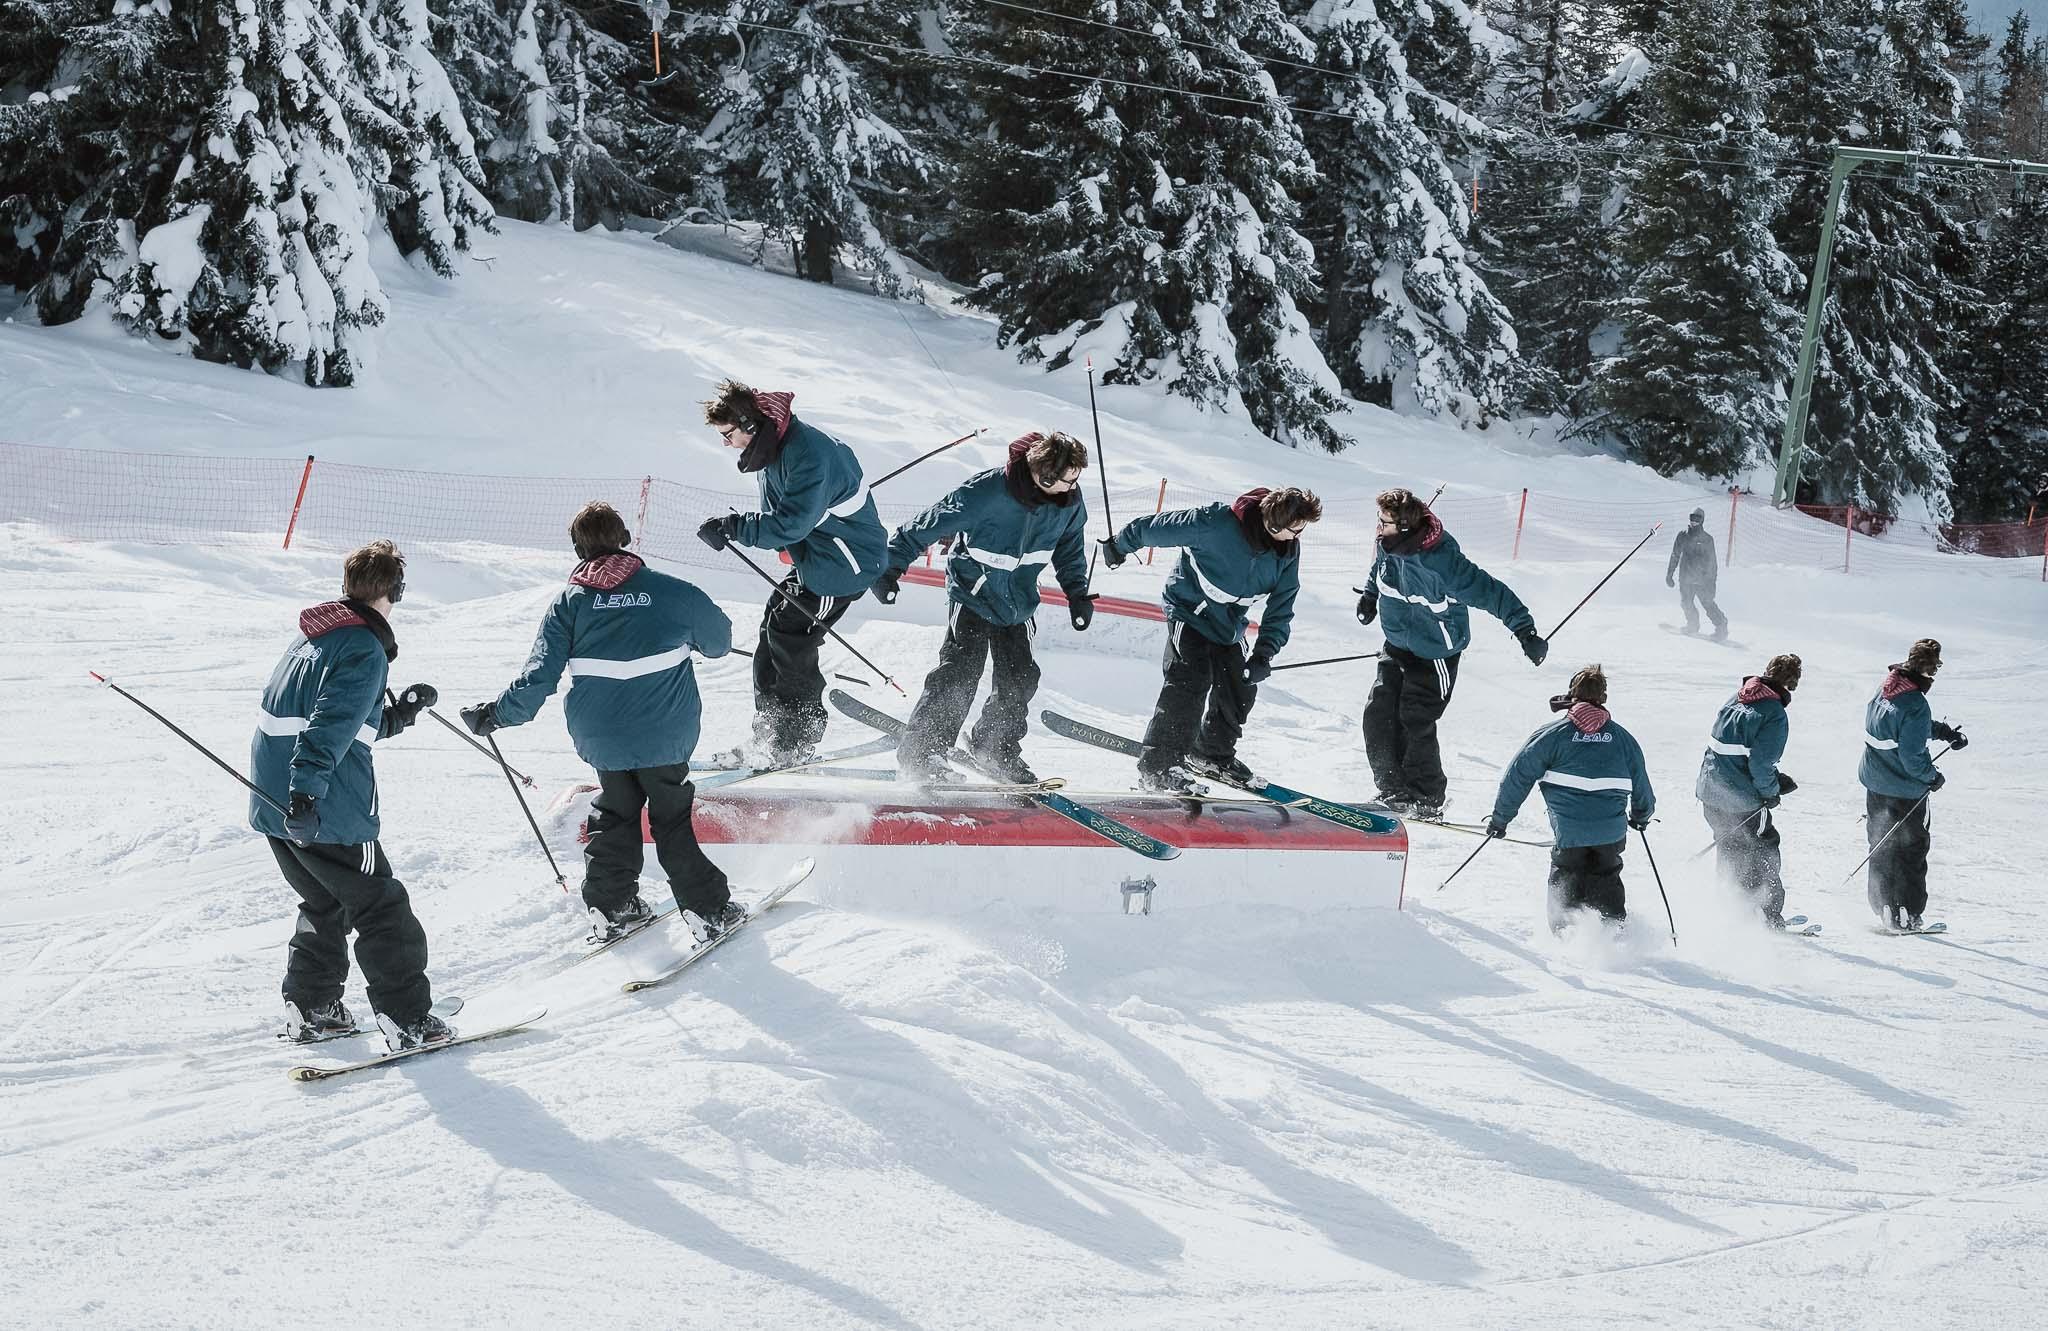 Spot: Snowpark Patscherkofel - Trick: 2 on pretz 2 - Foto: Jörg Angeli